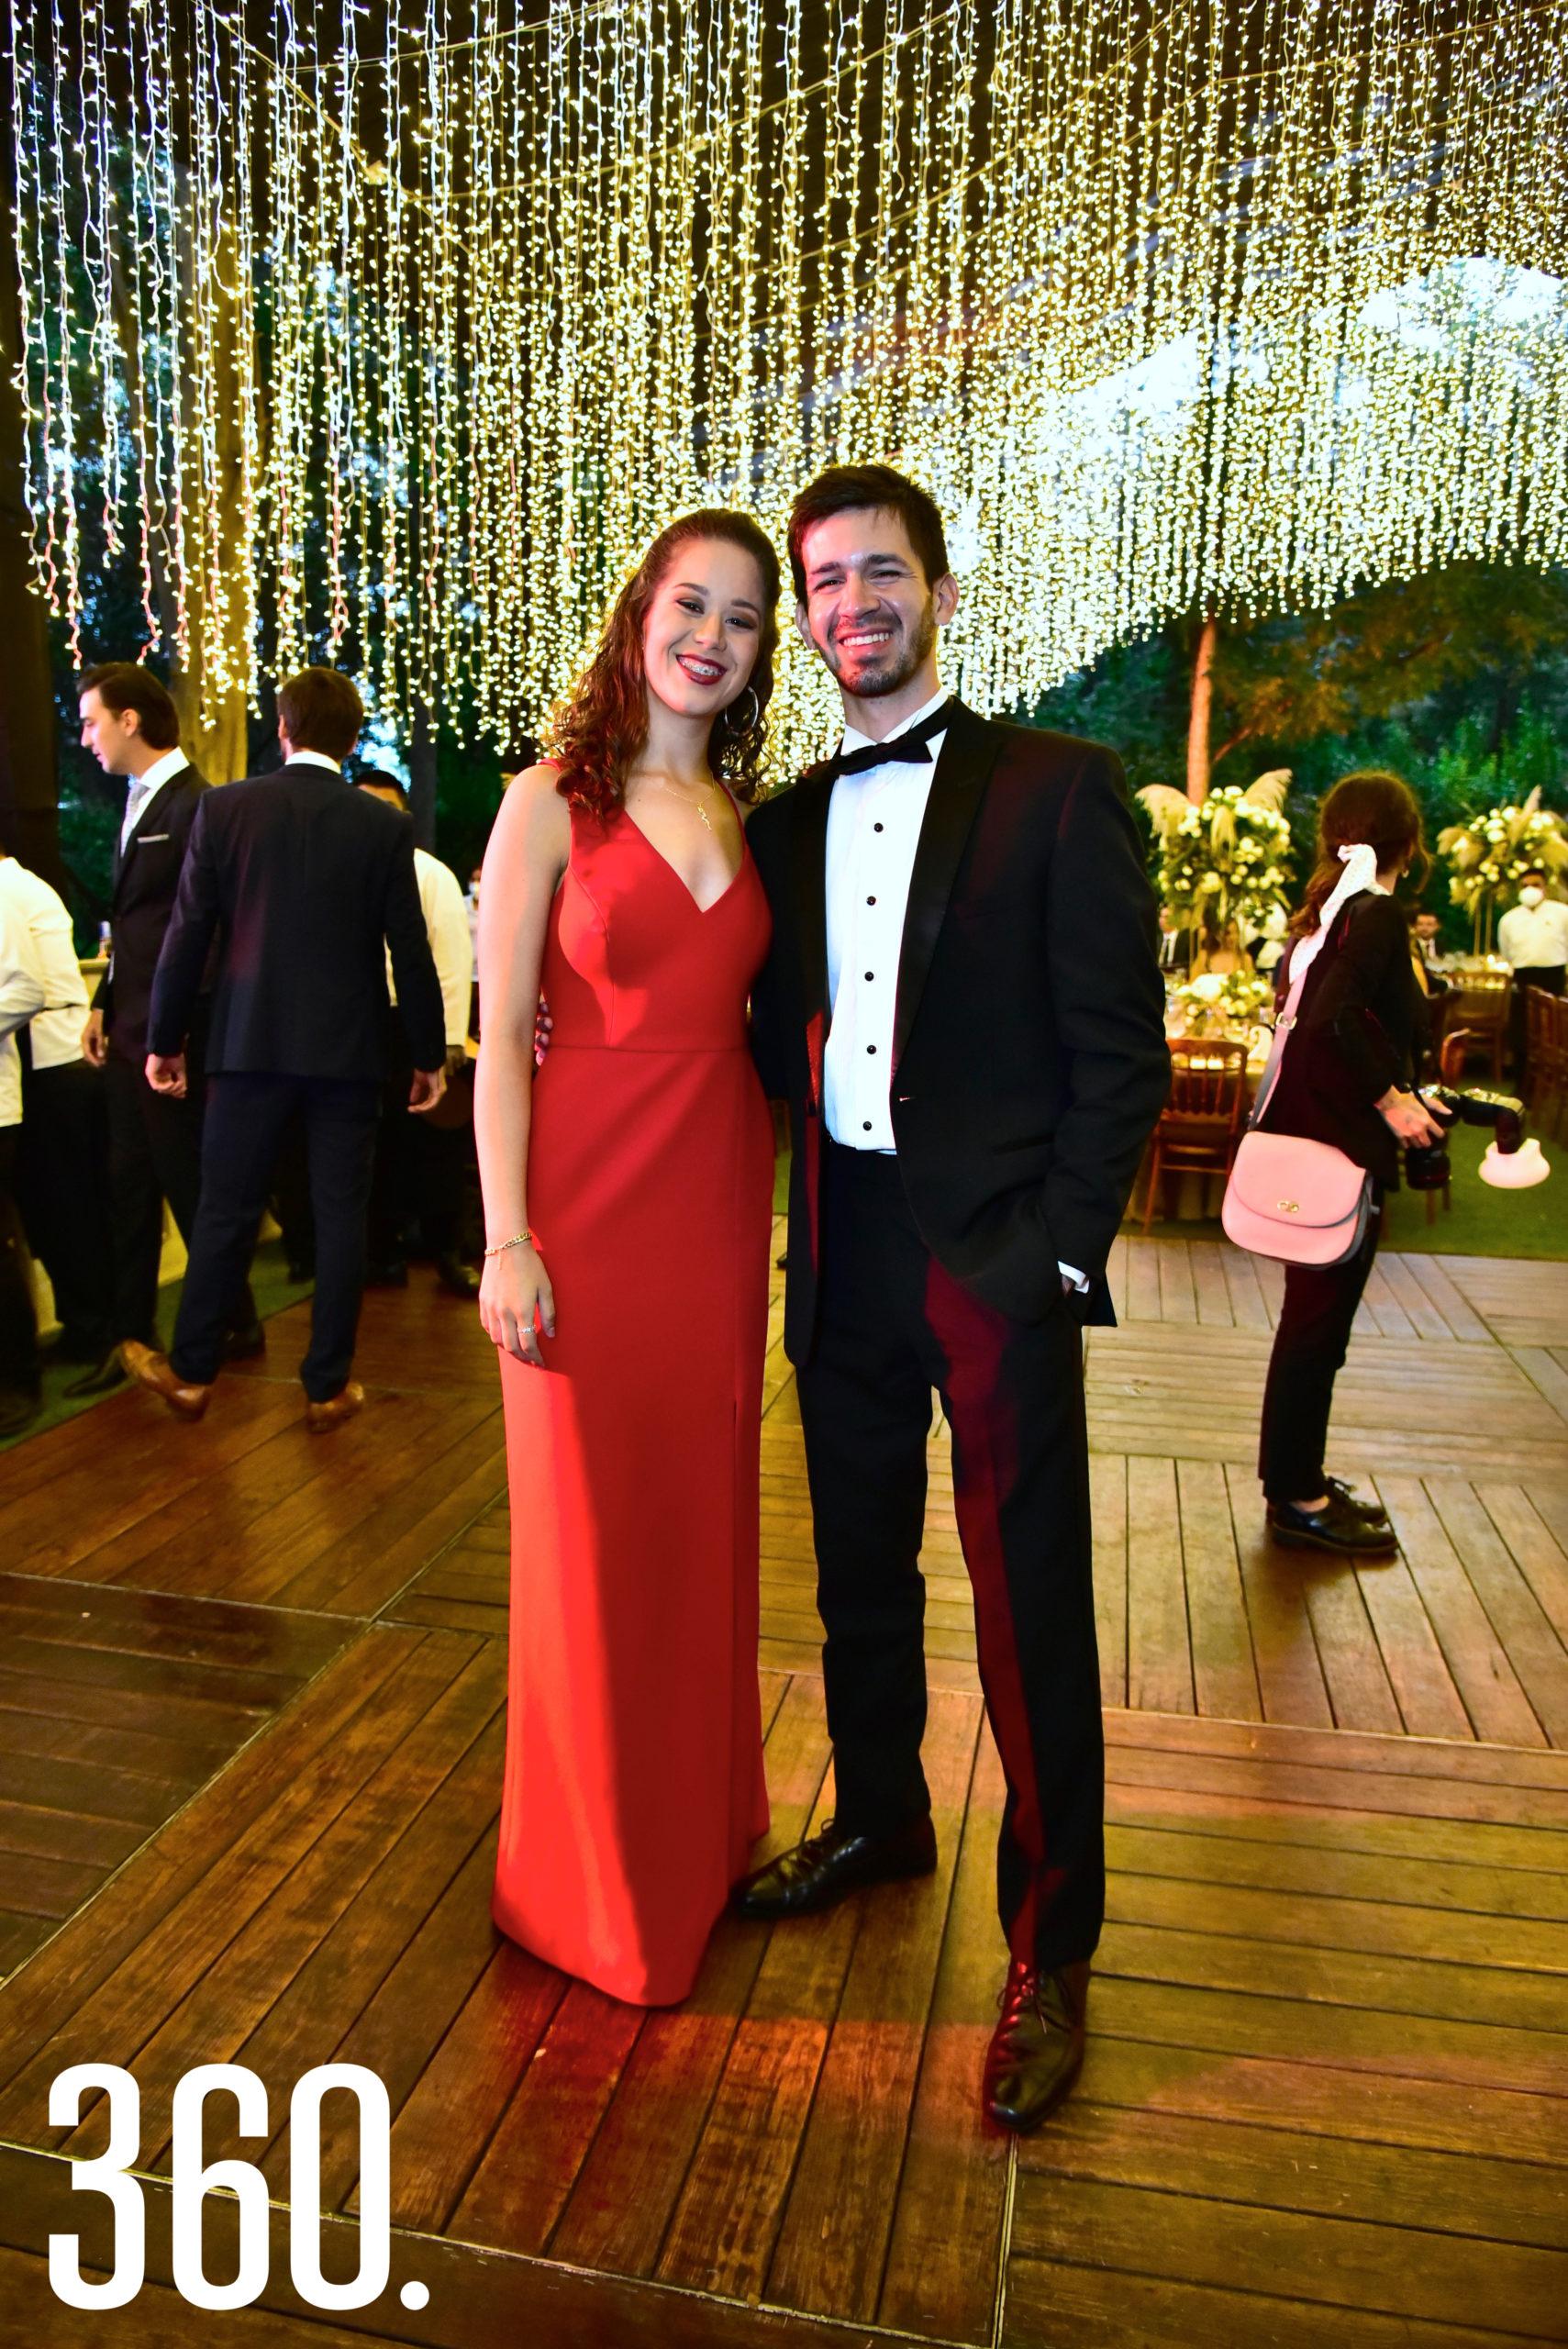 Fernanda Vásquez y Daniel Vásquez.